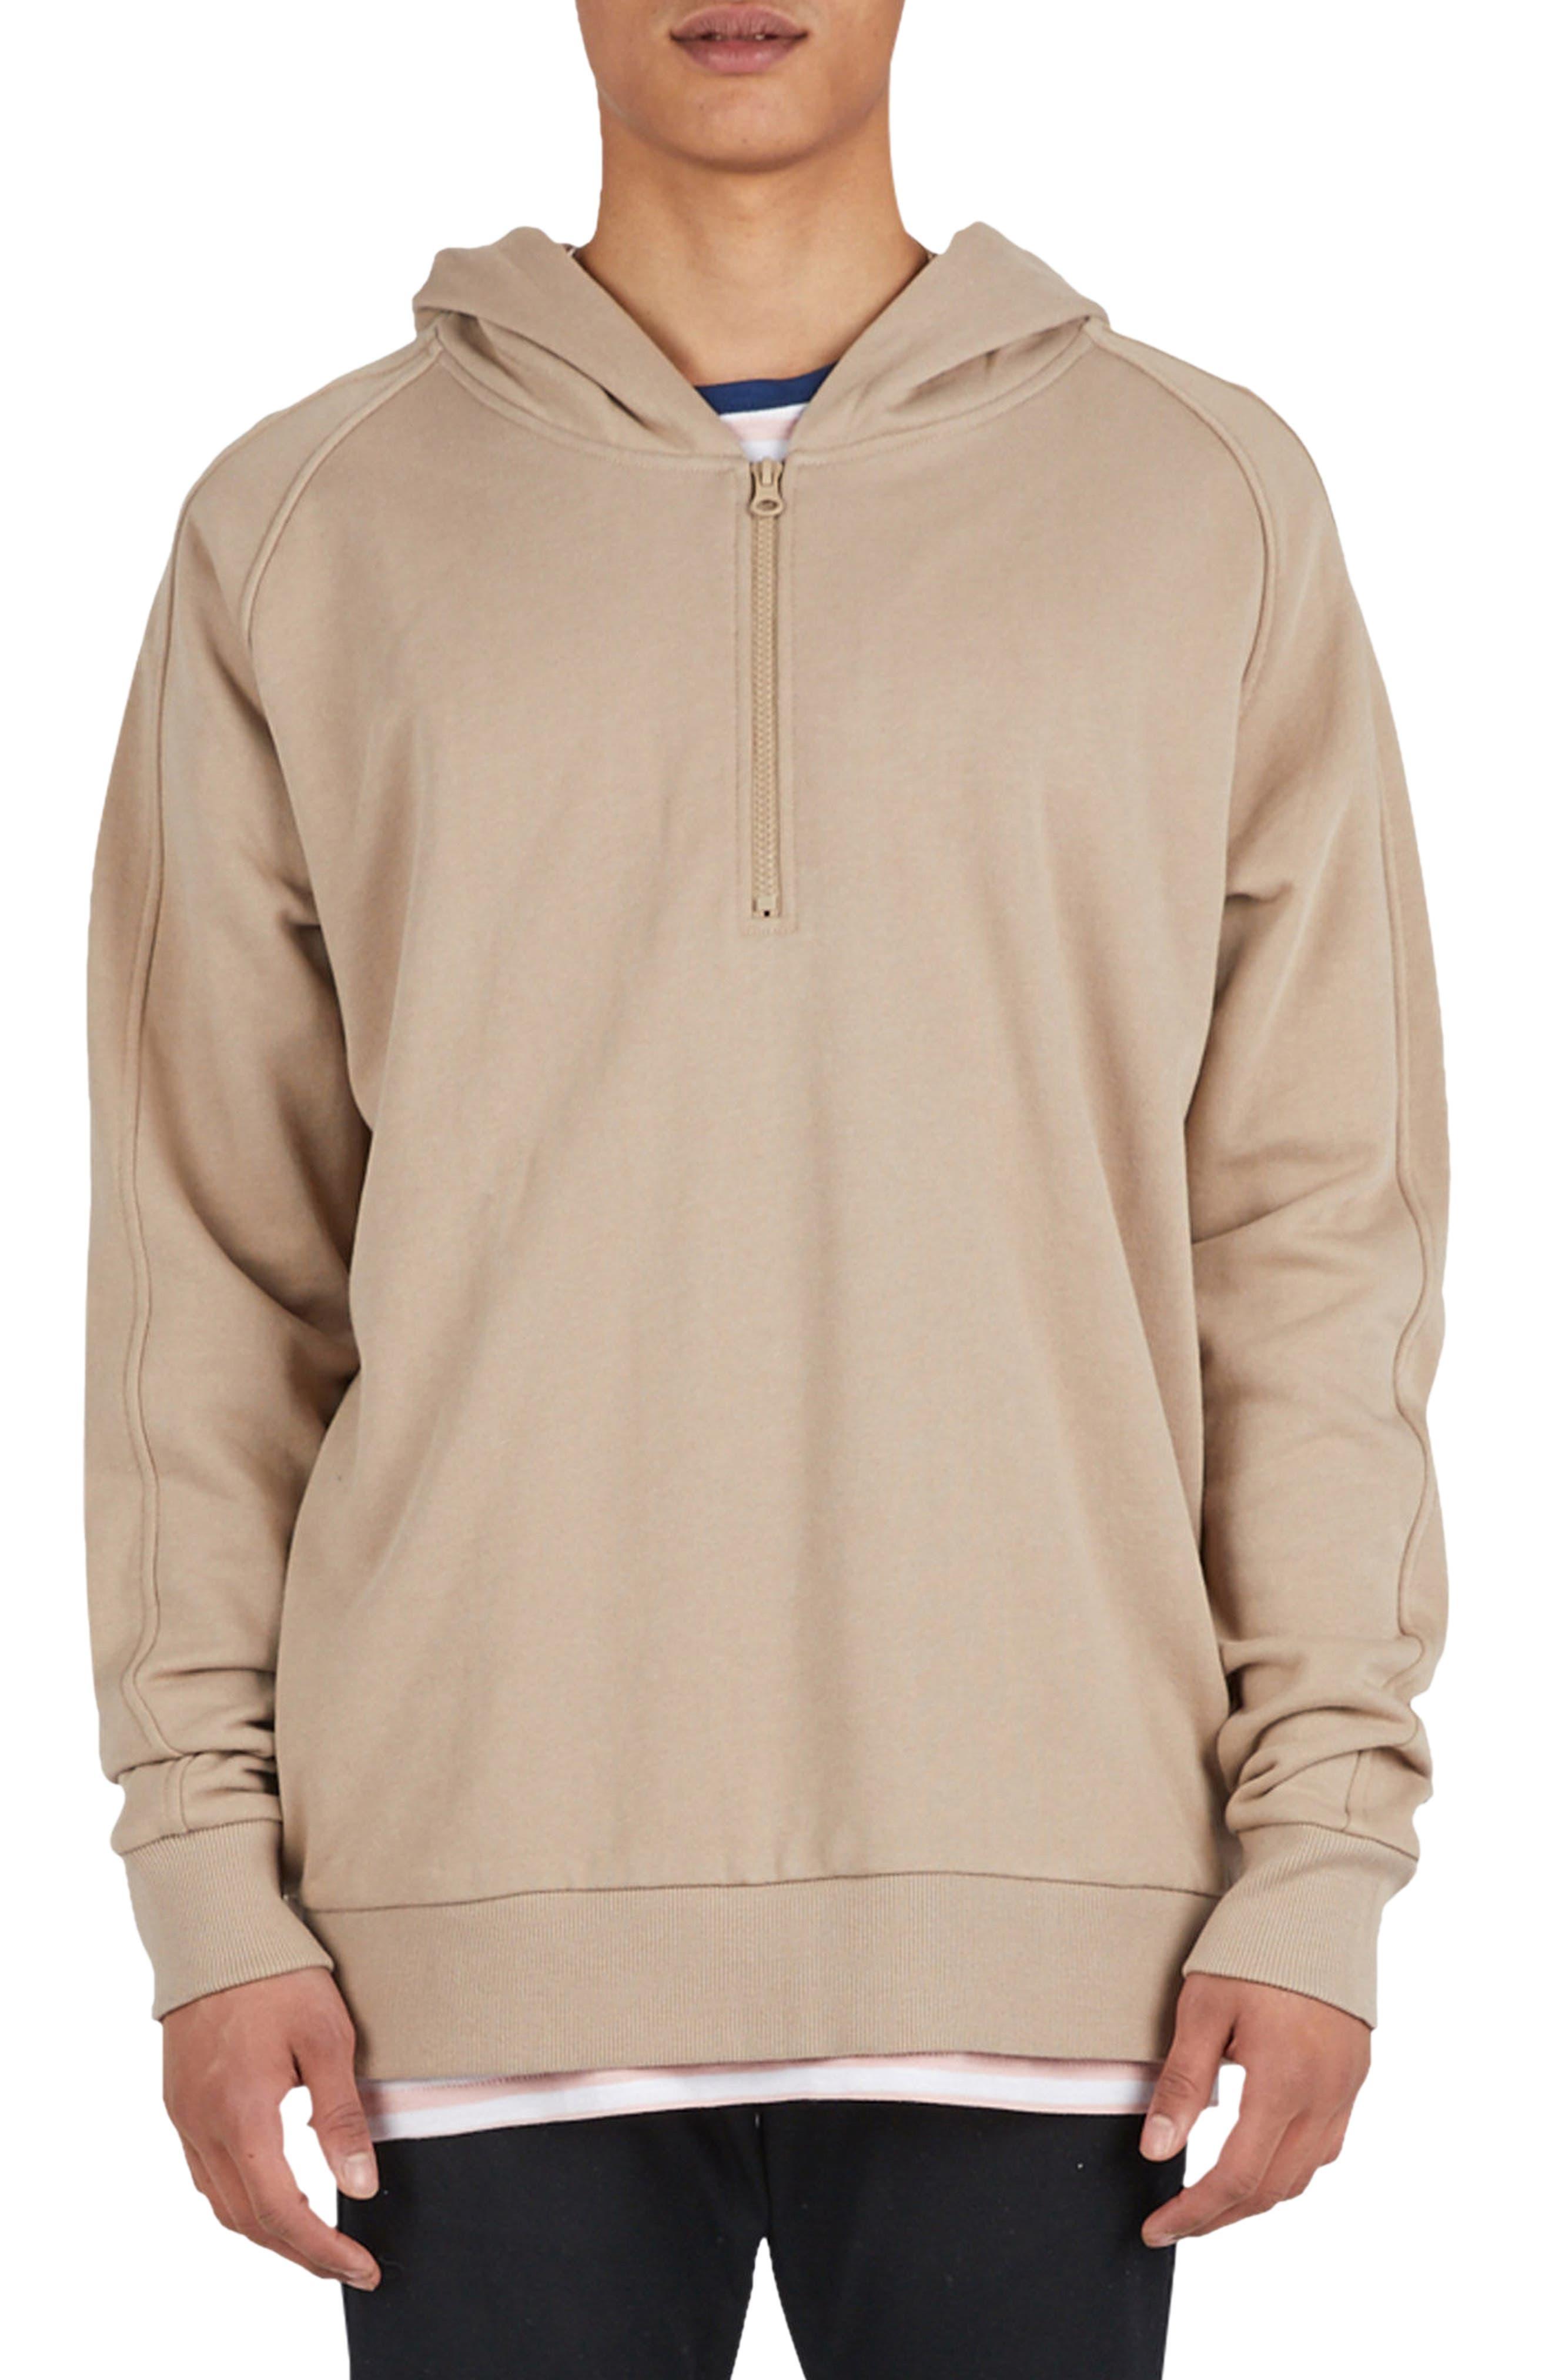 Barney Cools Olympic Zip Pullover Hoodie | Nordstrom